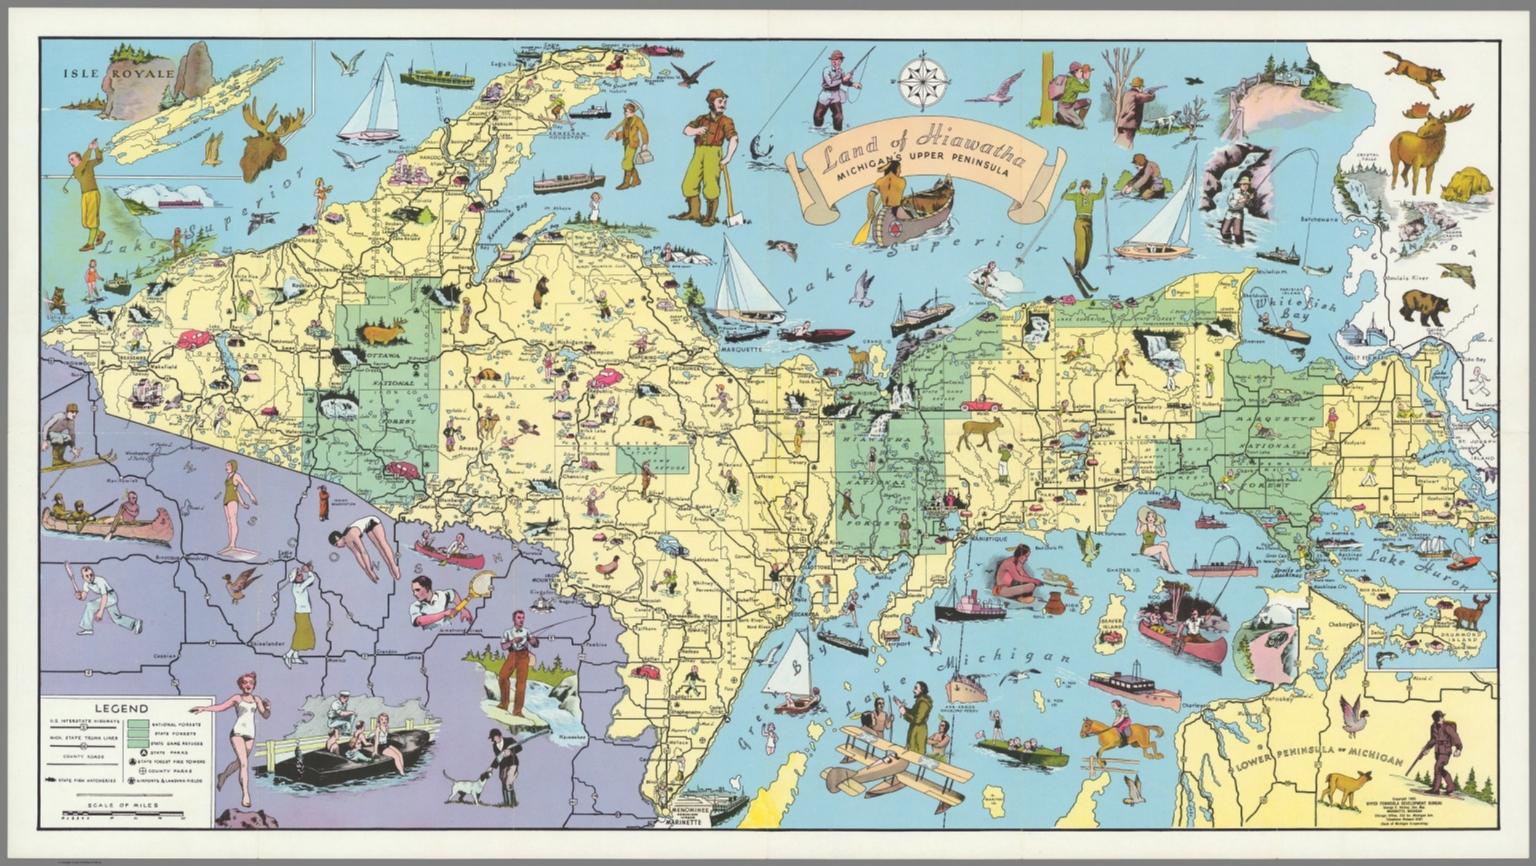 photo regarding Printable Map of Upper Peninsula Michigan titled Land of Hiawatha, Michigans Higher Peninsula - David Rumsey